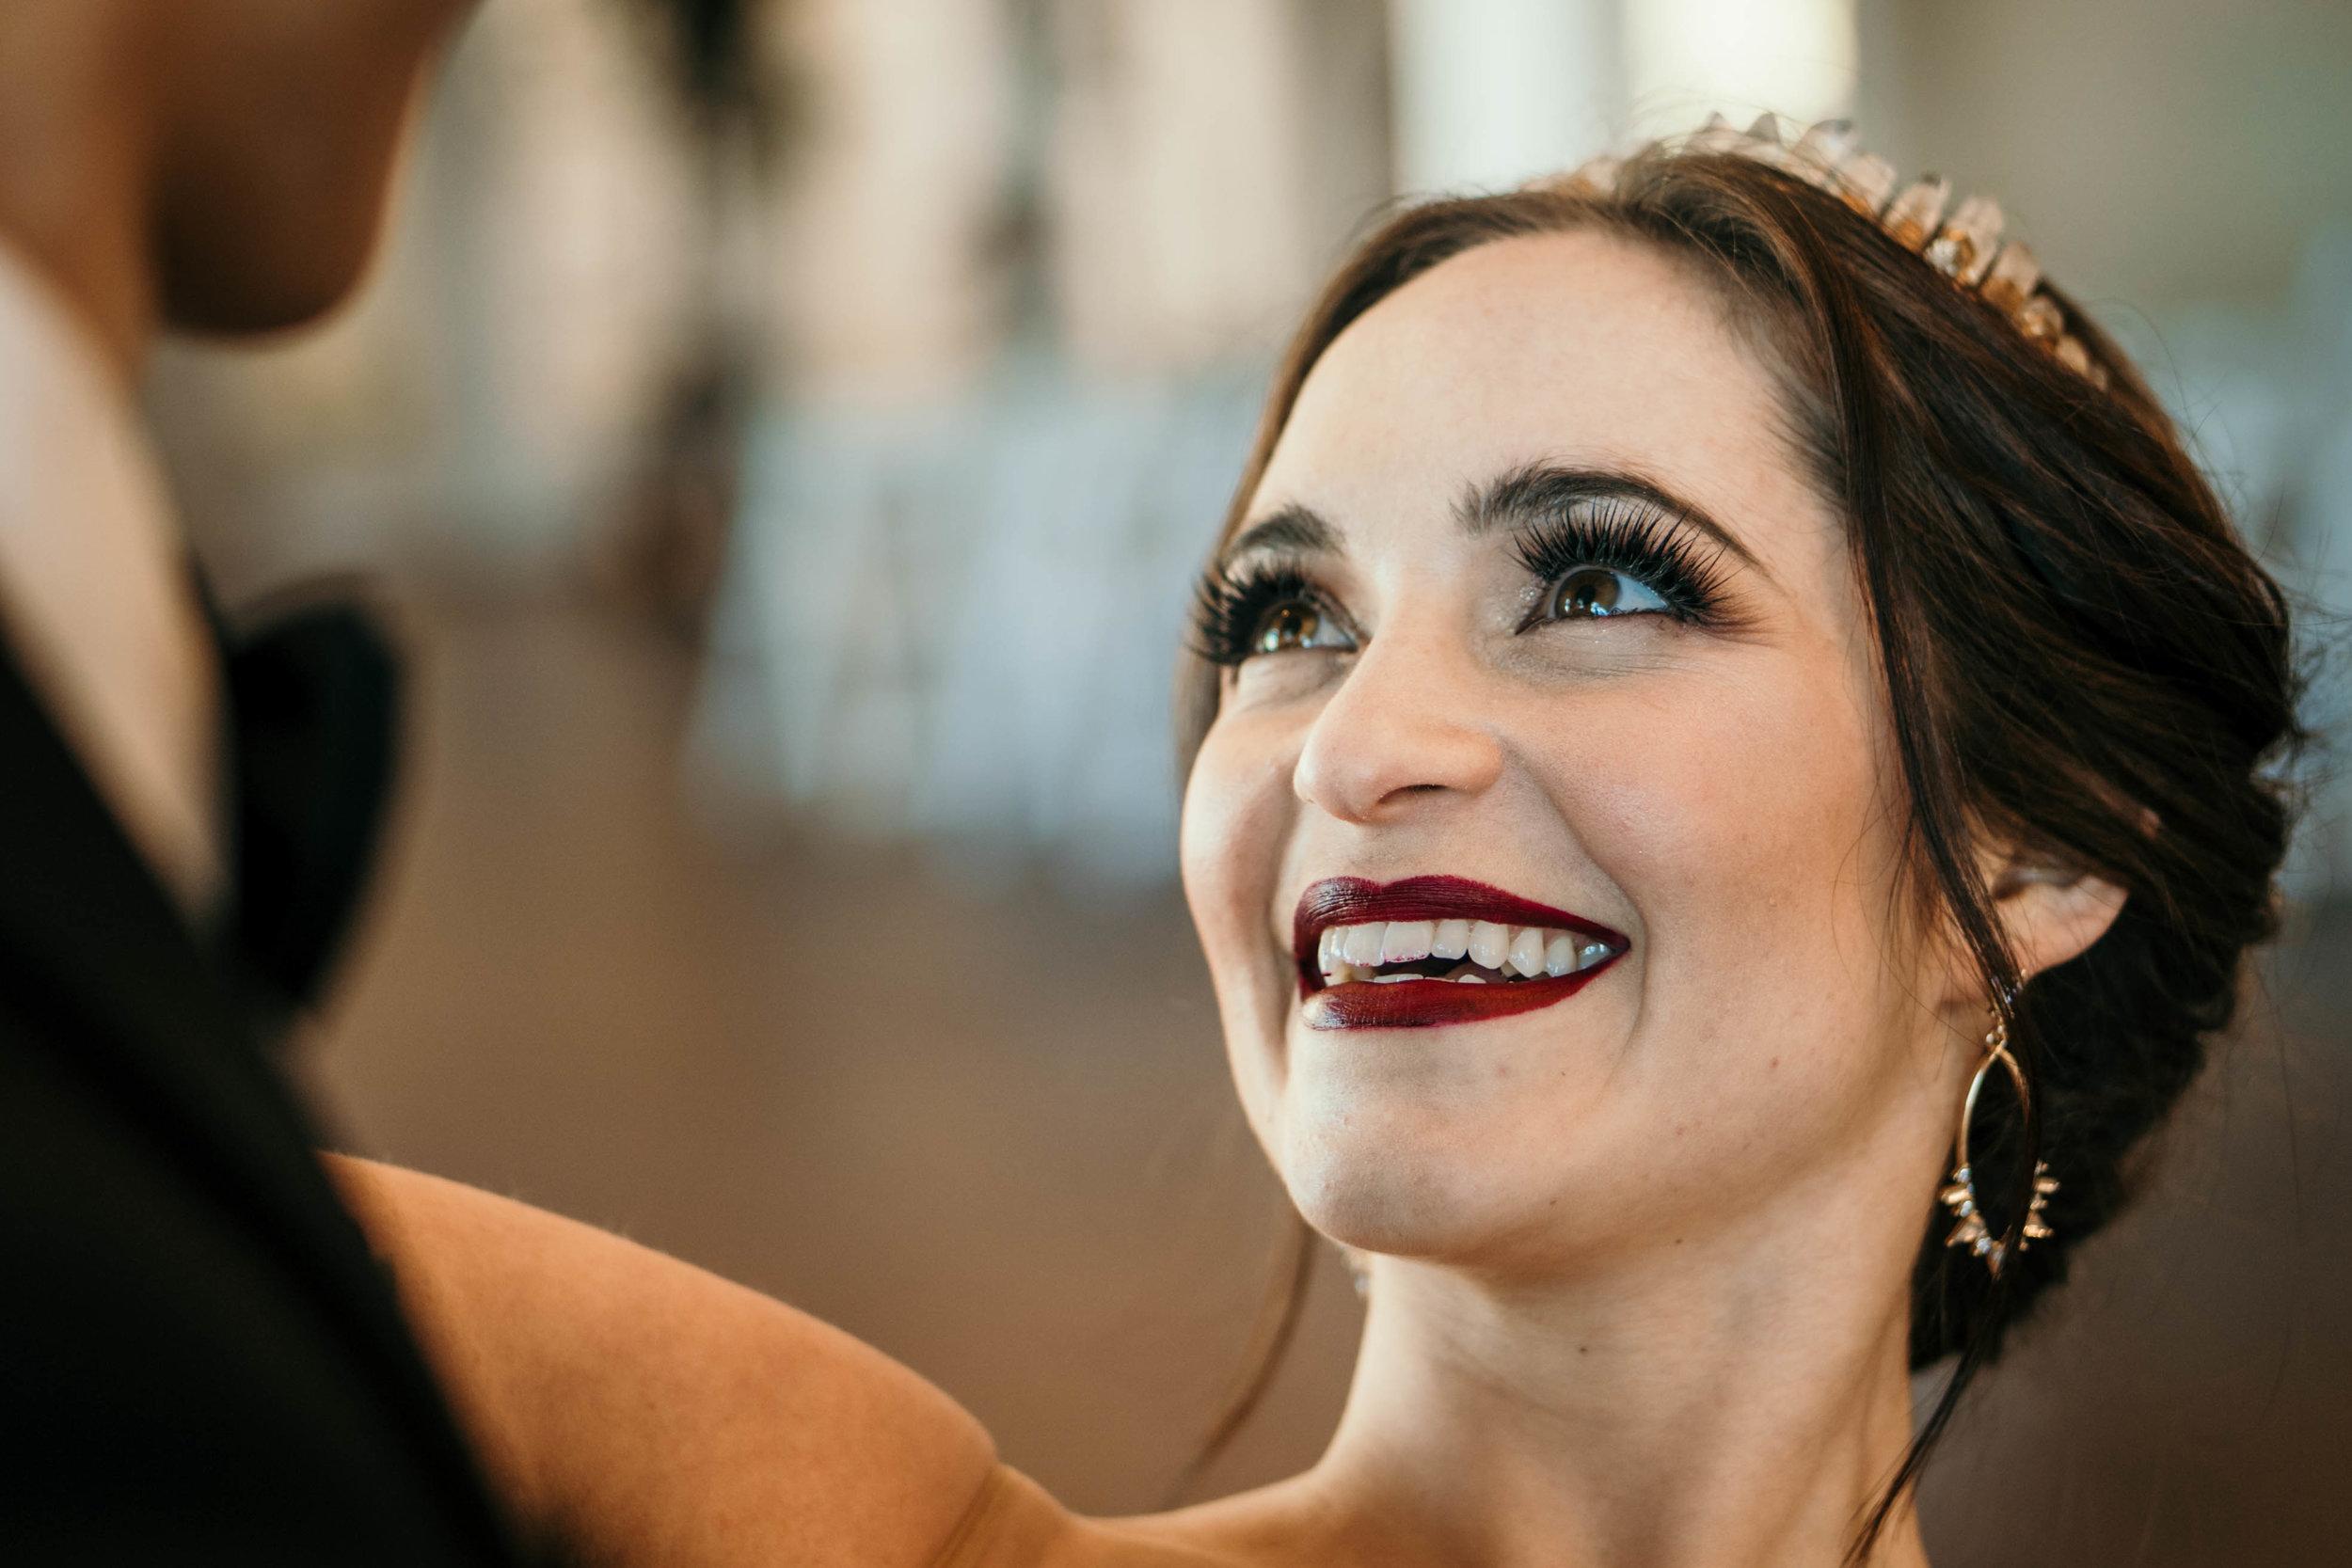 Austin Wedding Videographer - Dolls for Dolls (292 of 323).jpg